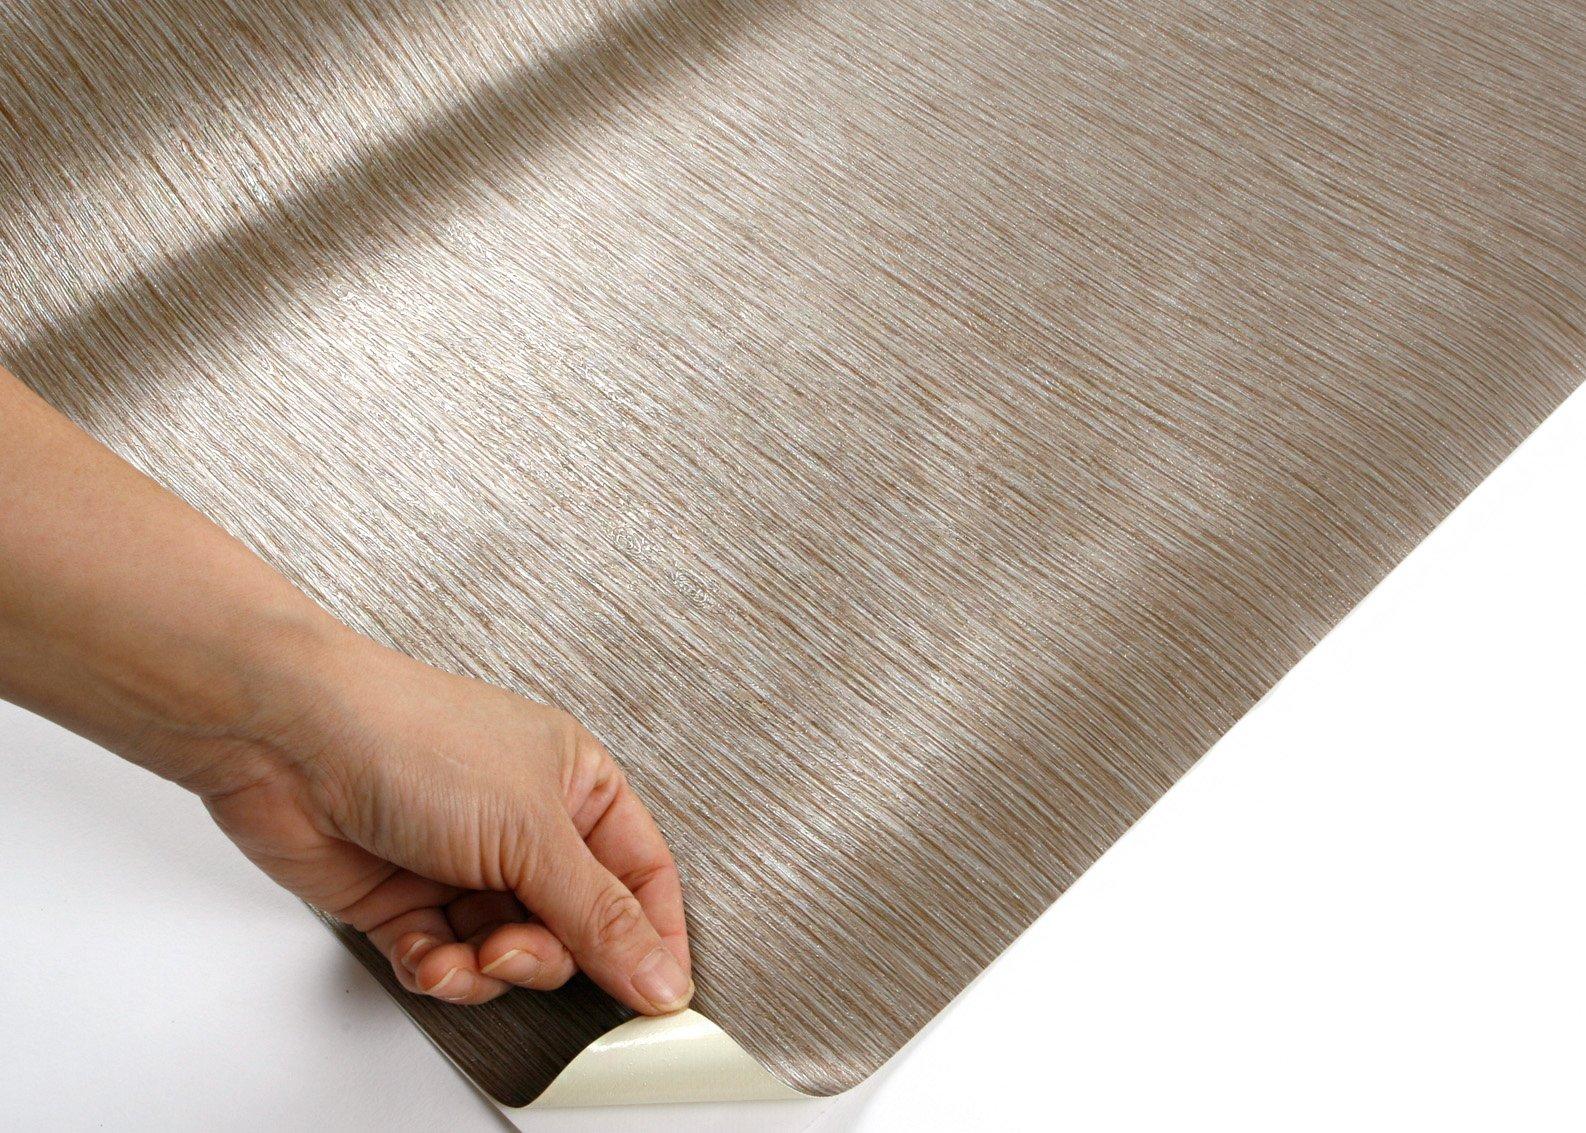 ROSEROSA Peel & Stick Backsplash Luxury Embossed Wood Contact Paper Self-adhesive Wallpaper Shelf Liner Table Door Reform (MG242 : 2.00 Feet X 6.56 Feet) by ROSEROSA (Image #4)